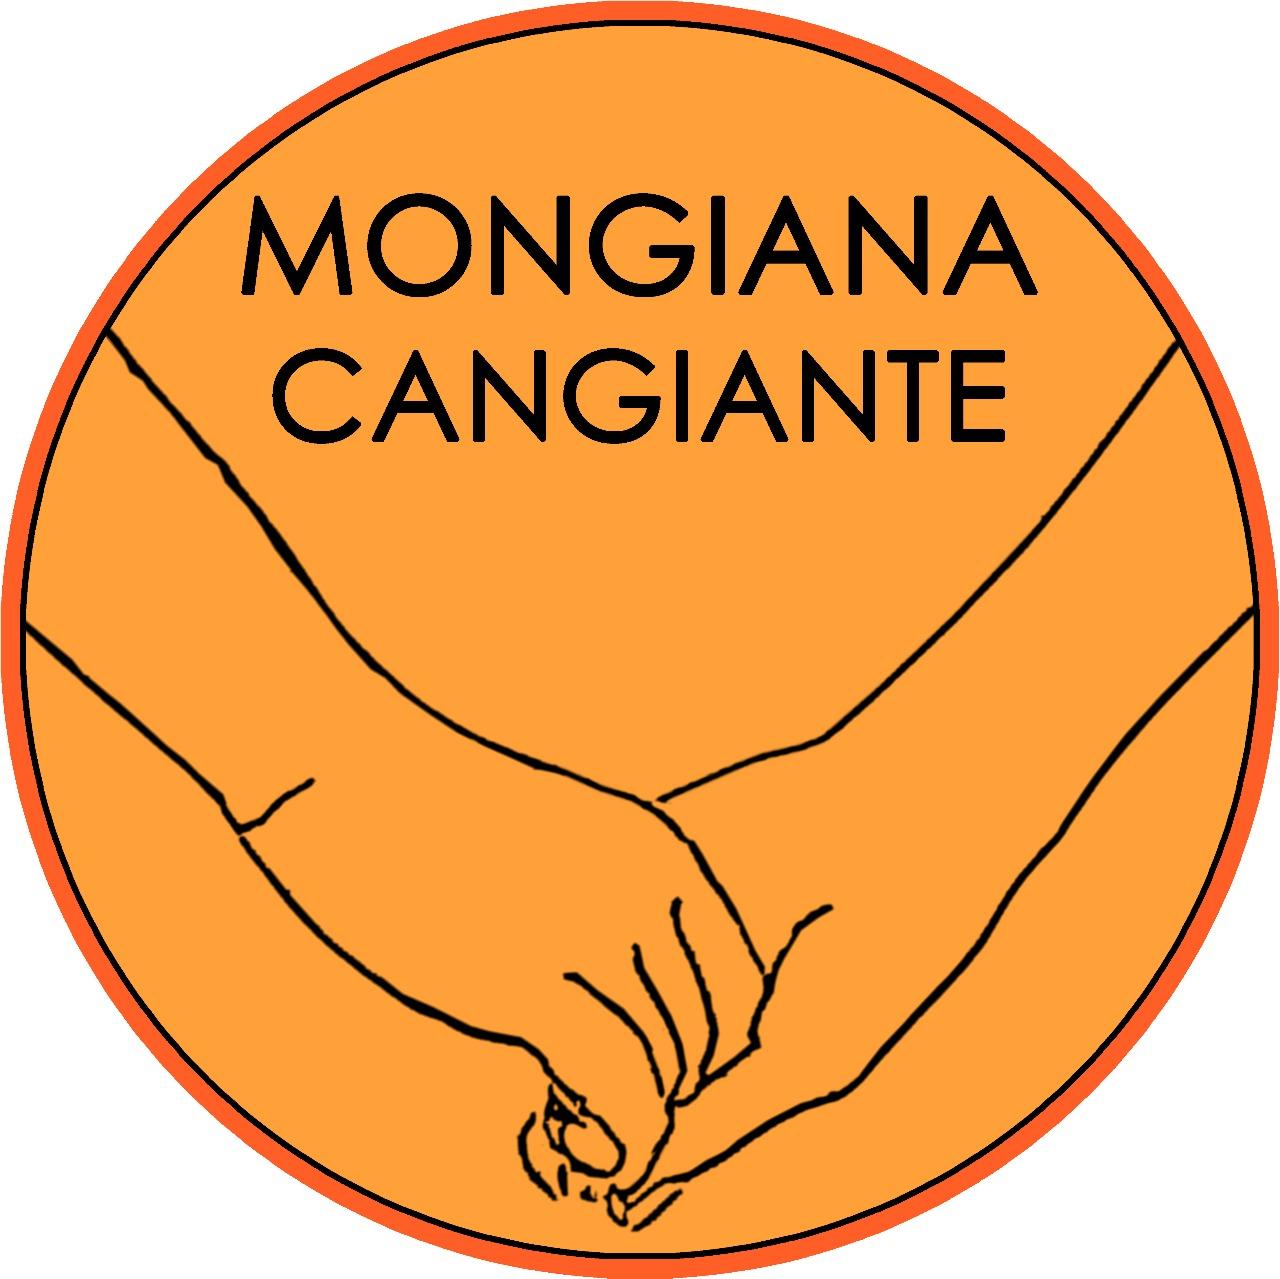 Mongiana Cangiante